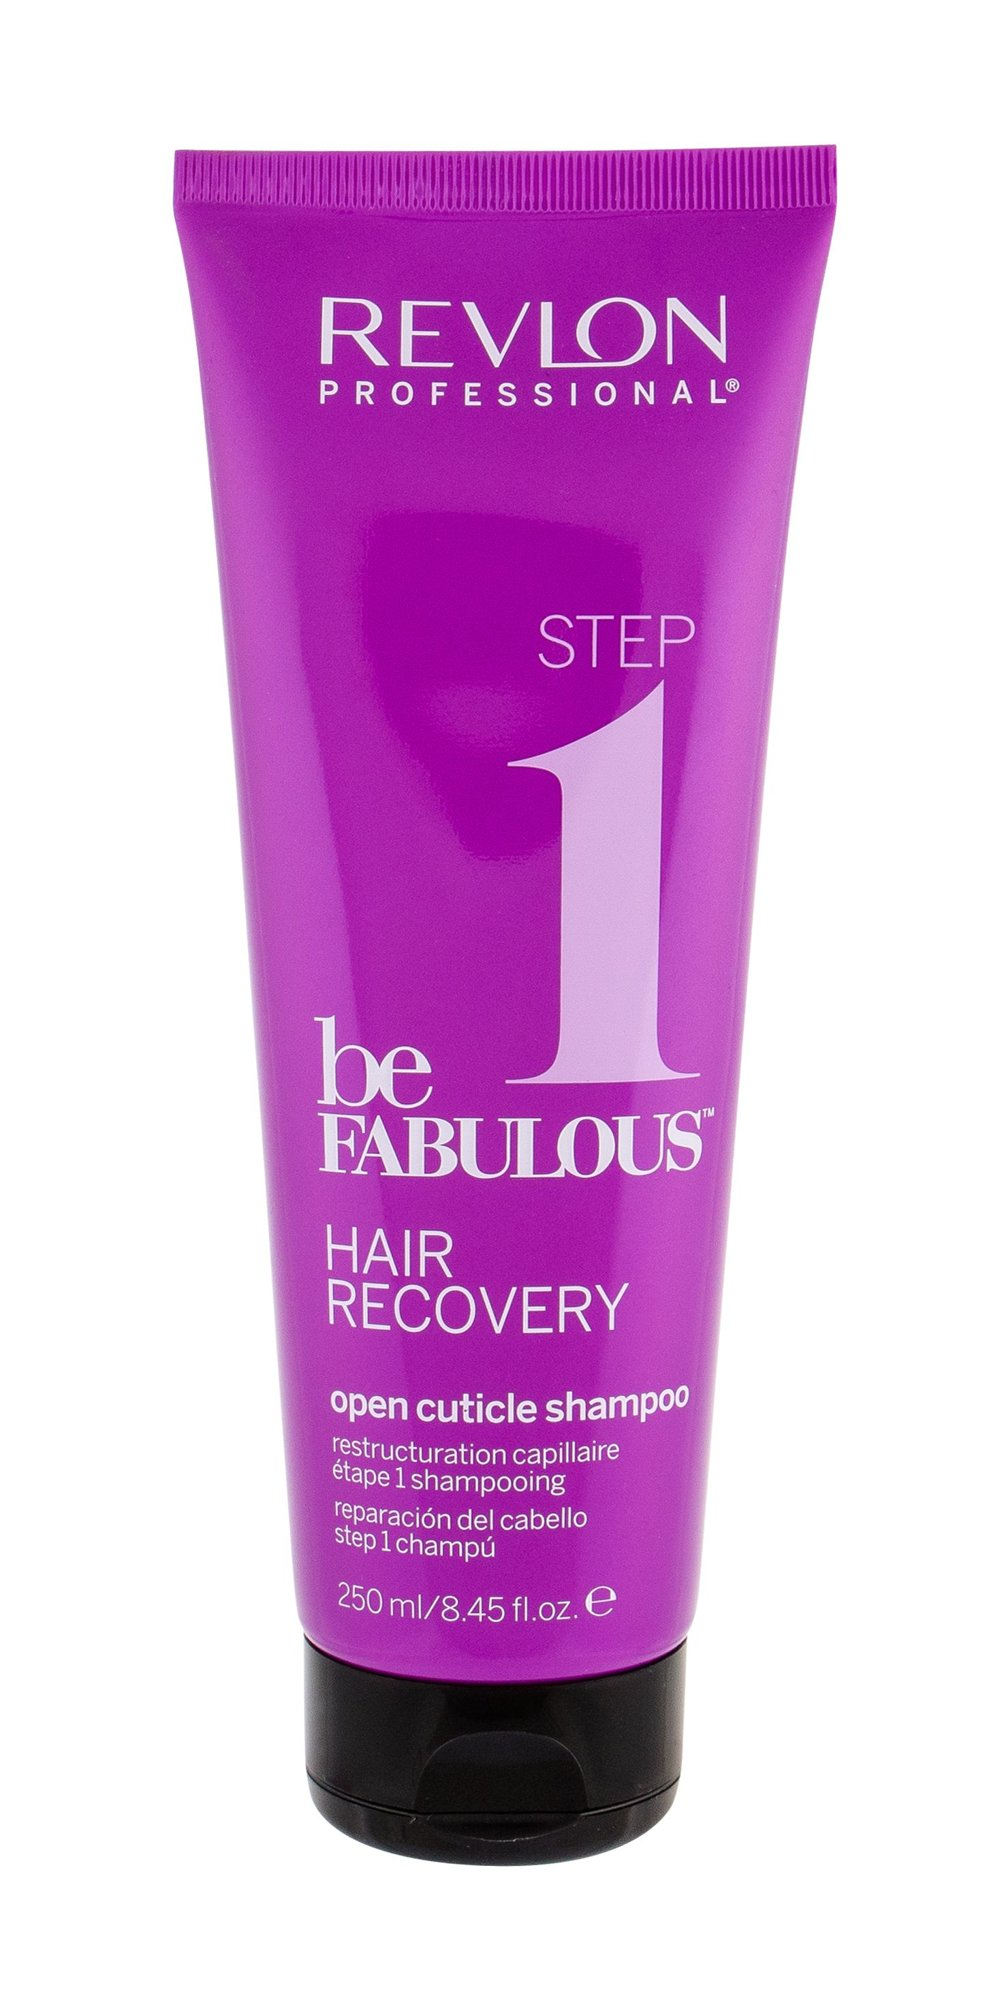 Revlon Professional Be Fabulous Shampoo 250ml